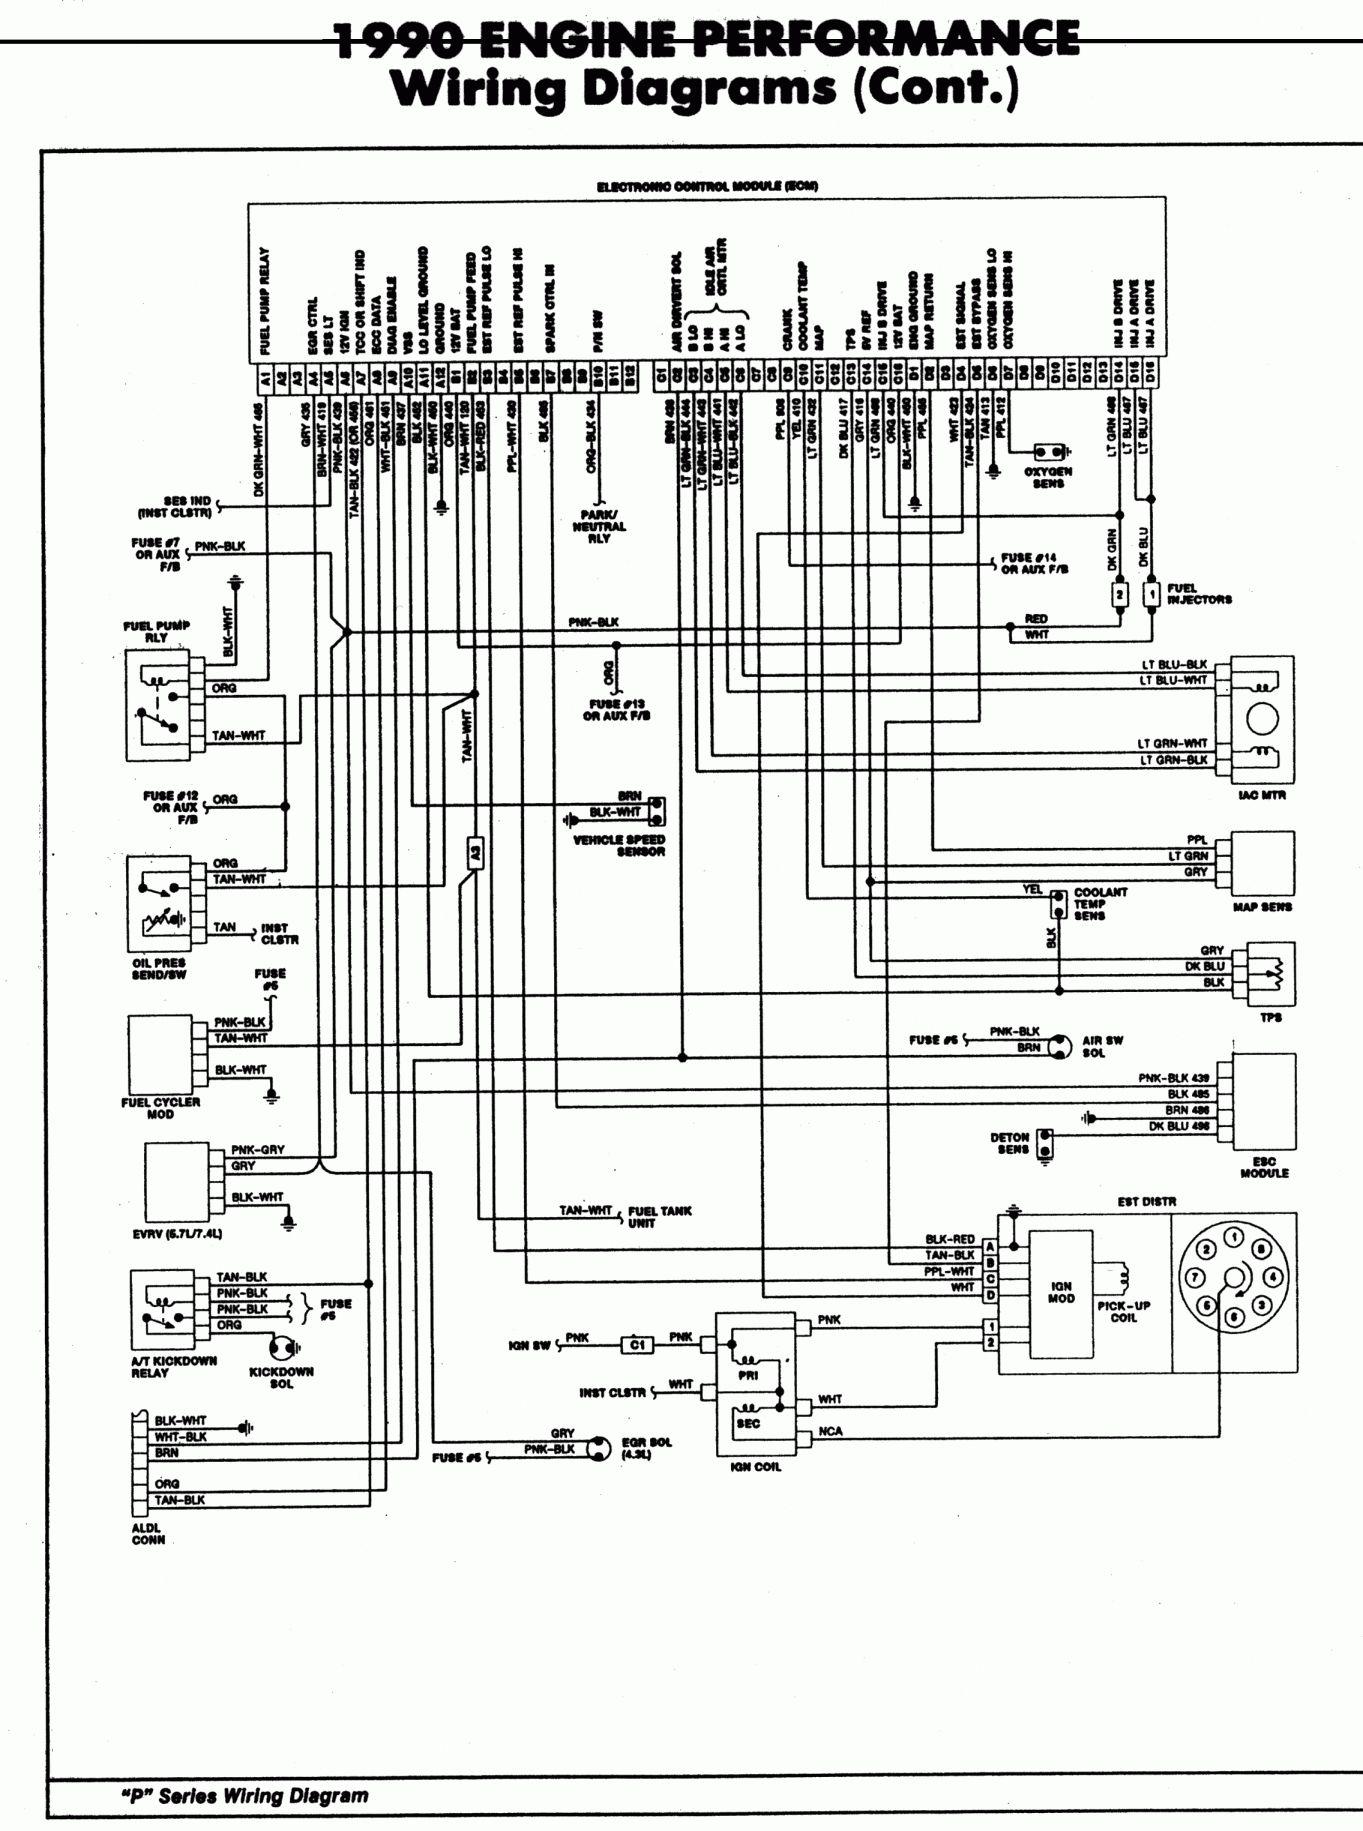 Chevy Tbi Wiring Diagram